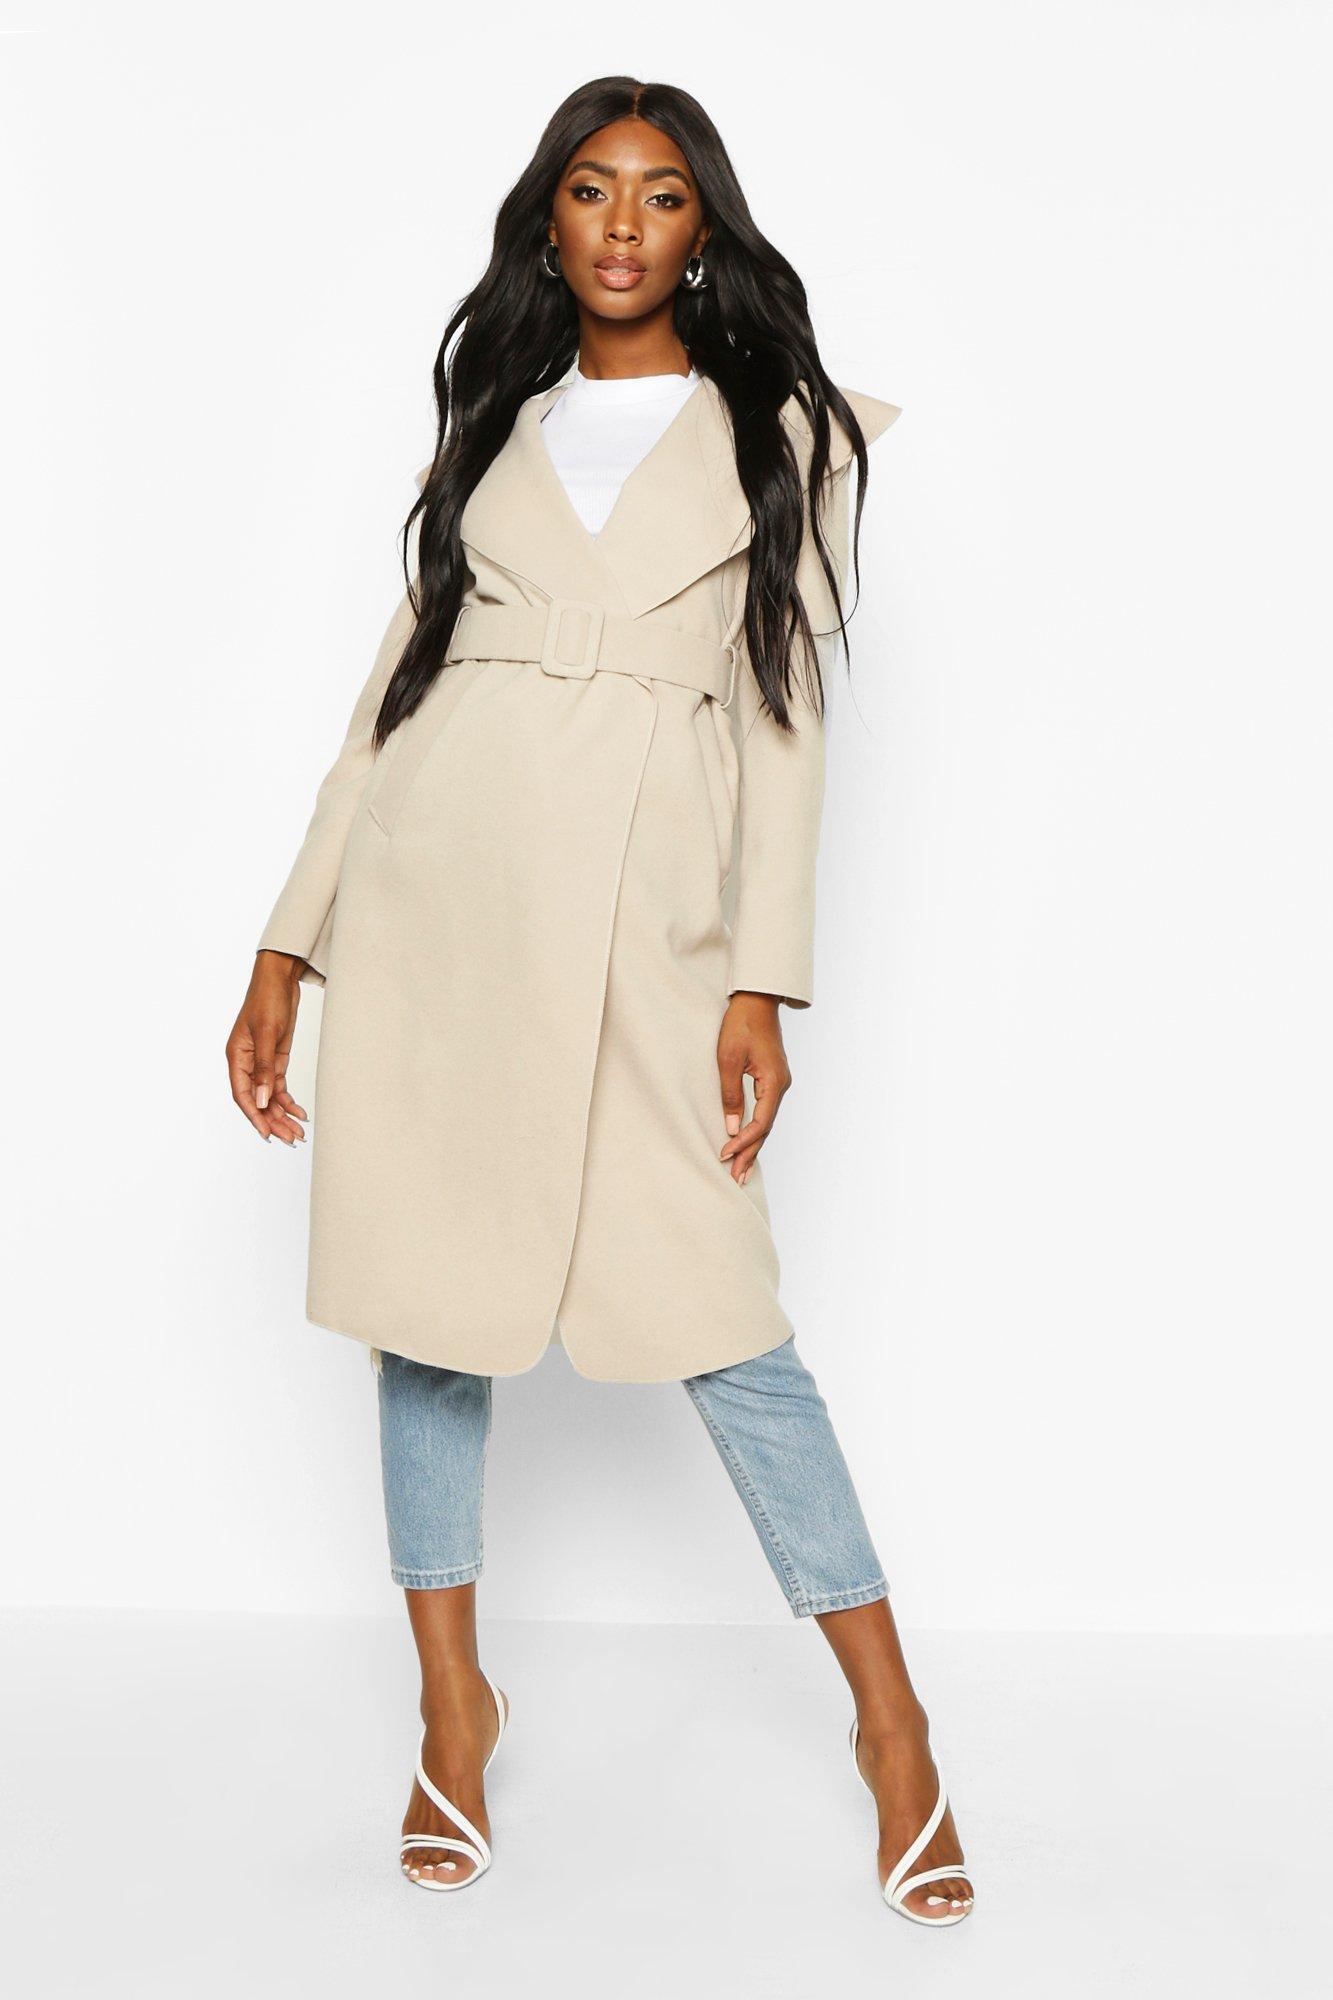 Self Fabric Buckle Belted Wool Look Coat